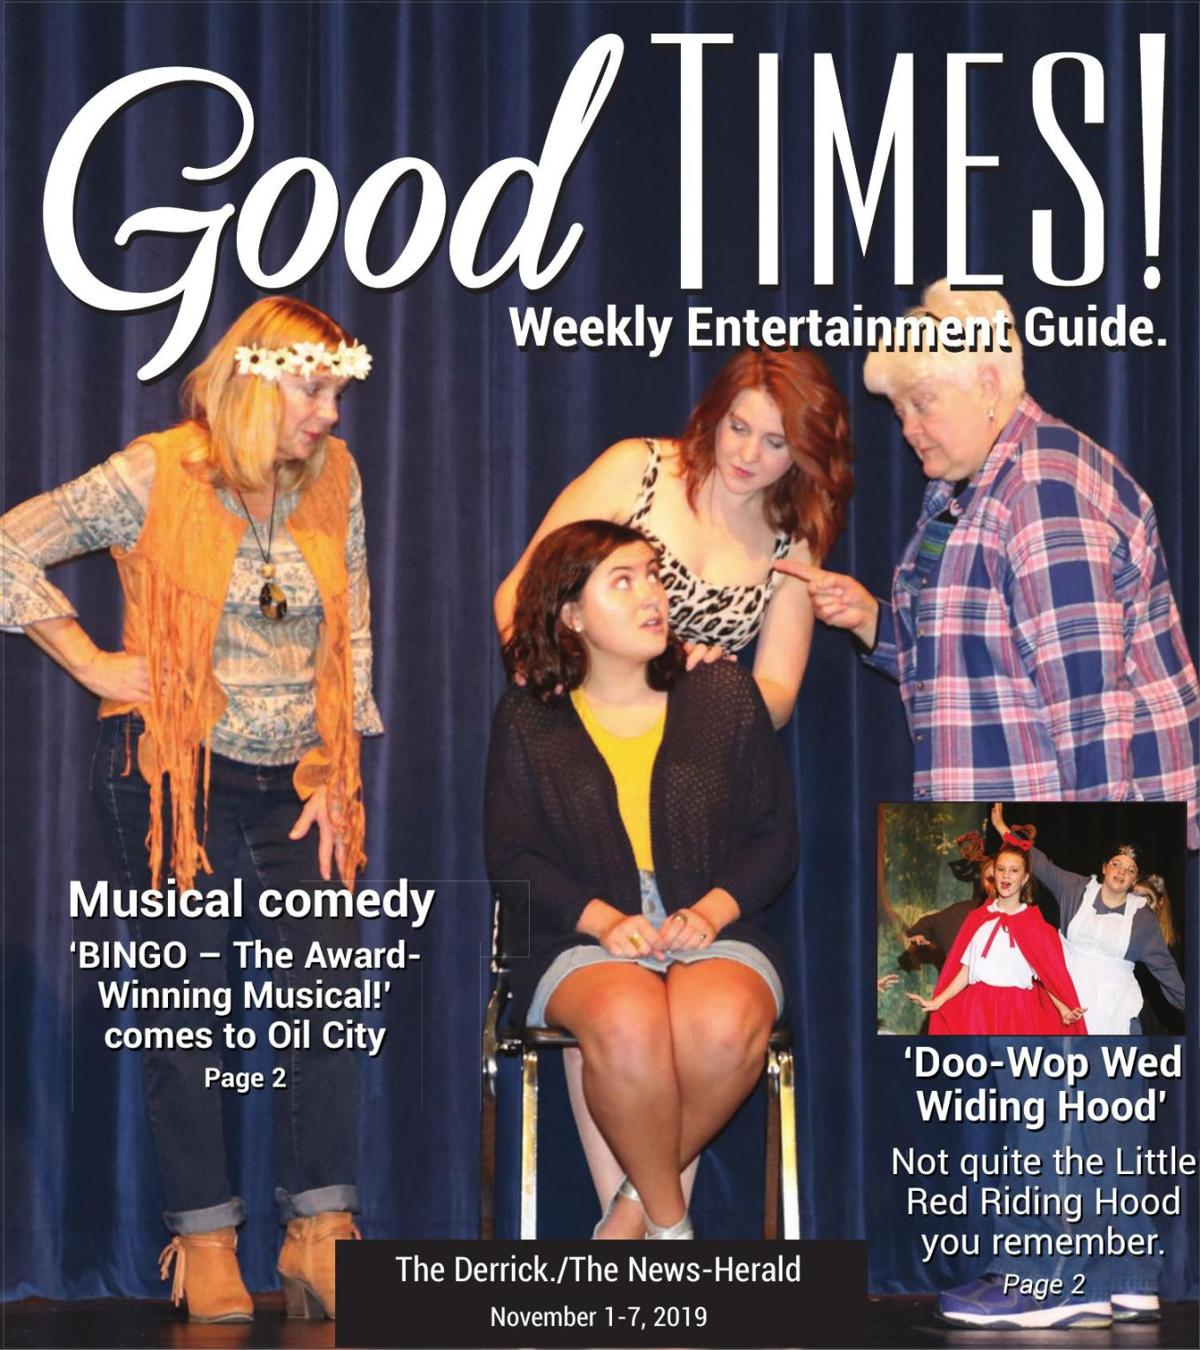 Good Times 11-01-19